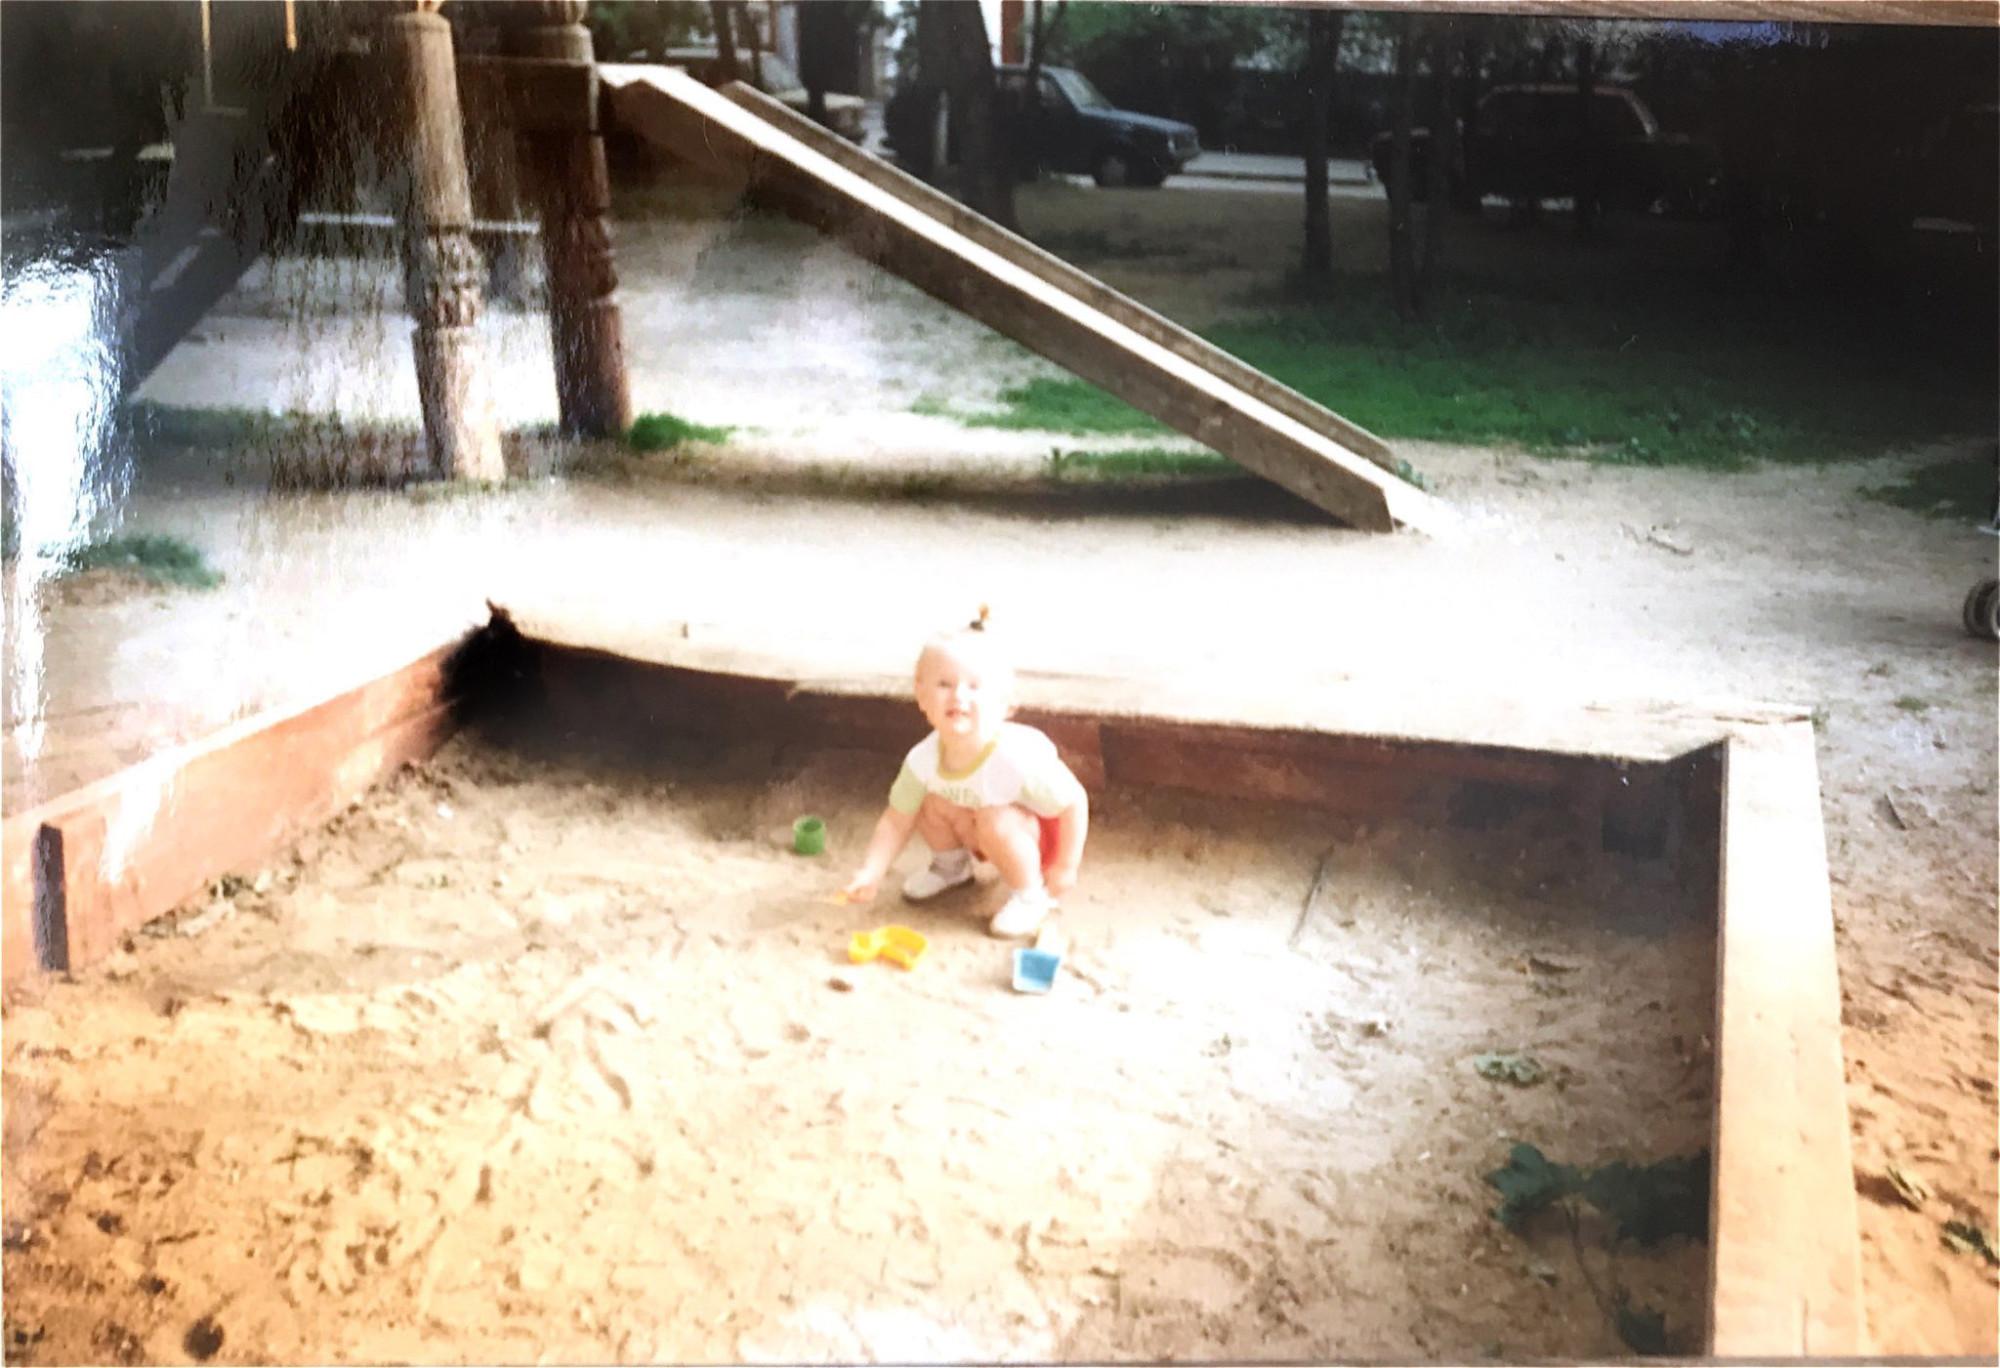 1995 Двор между домами 19 и 21. Наташа Рыбалко